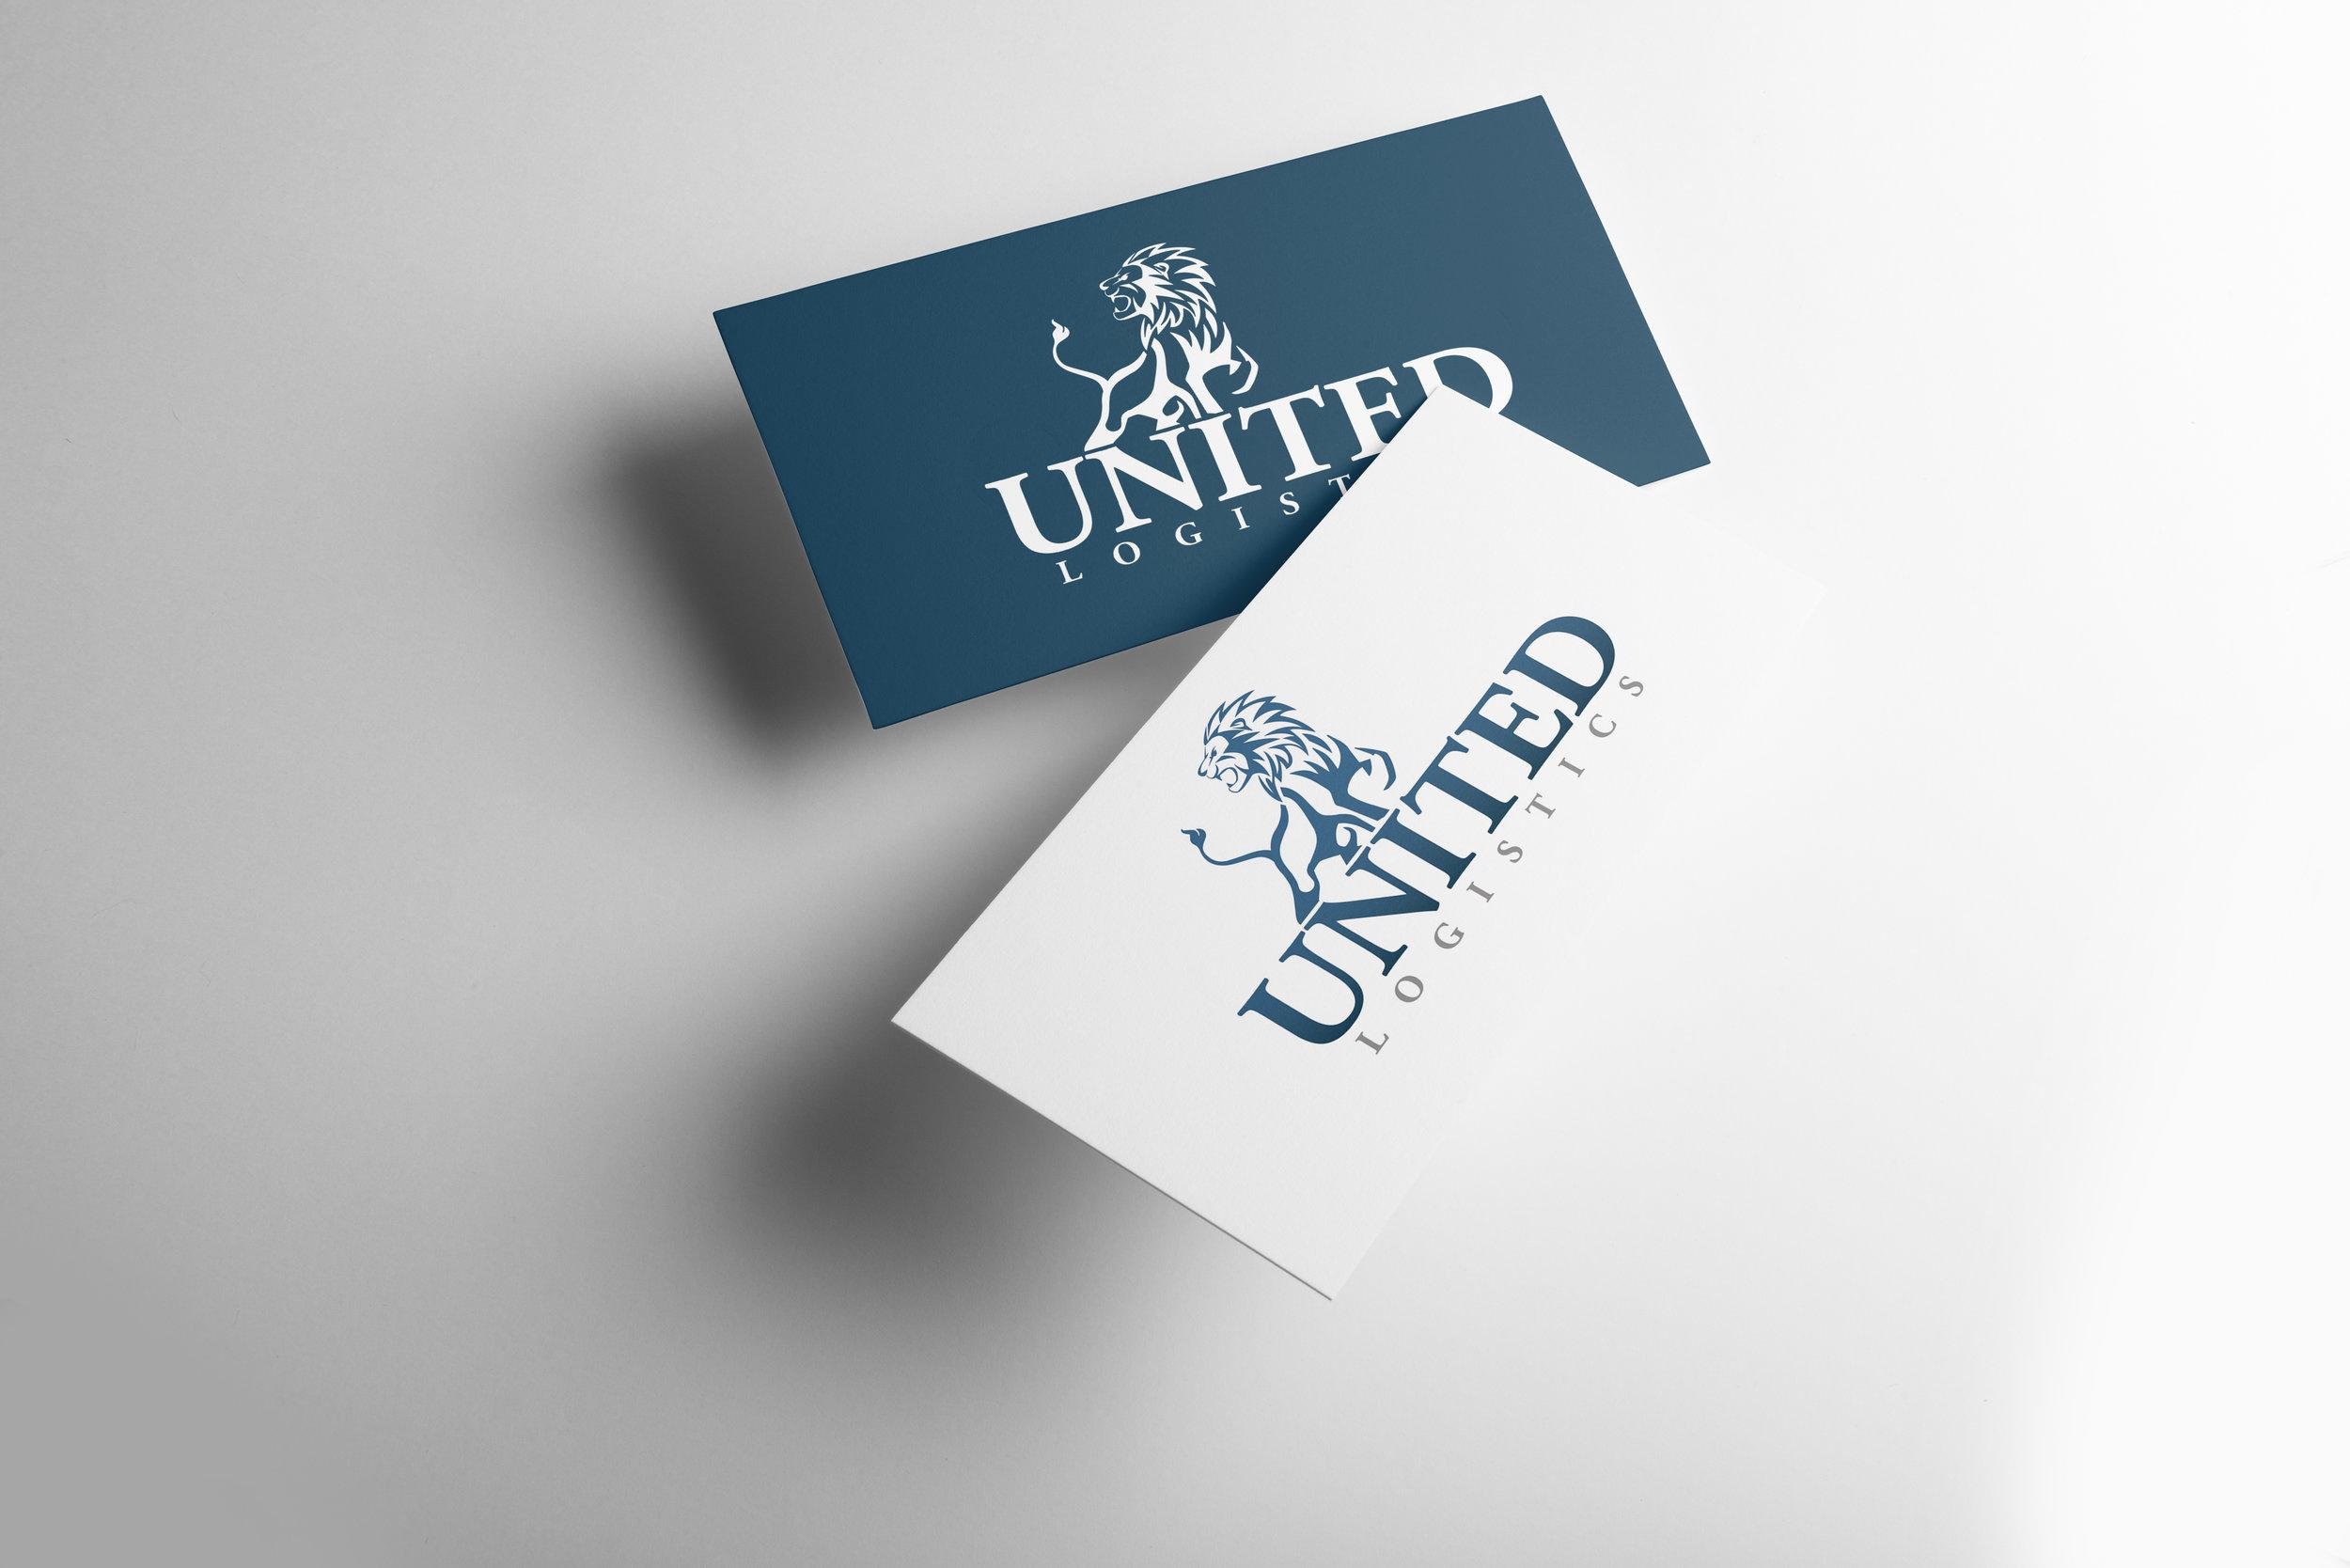 united logistics.jpg